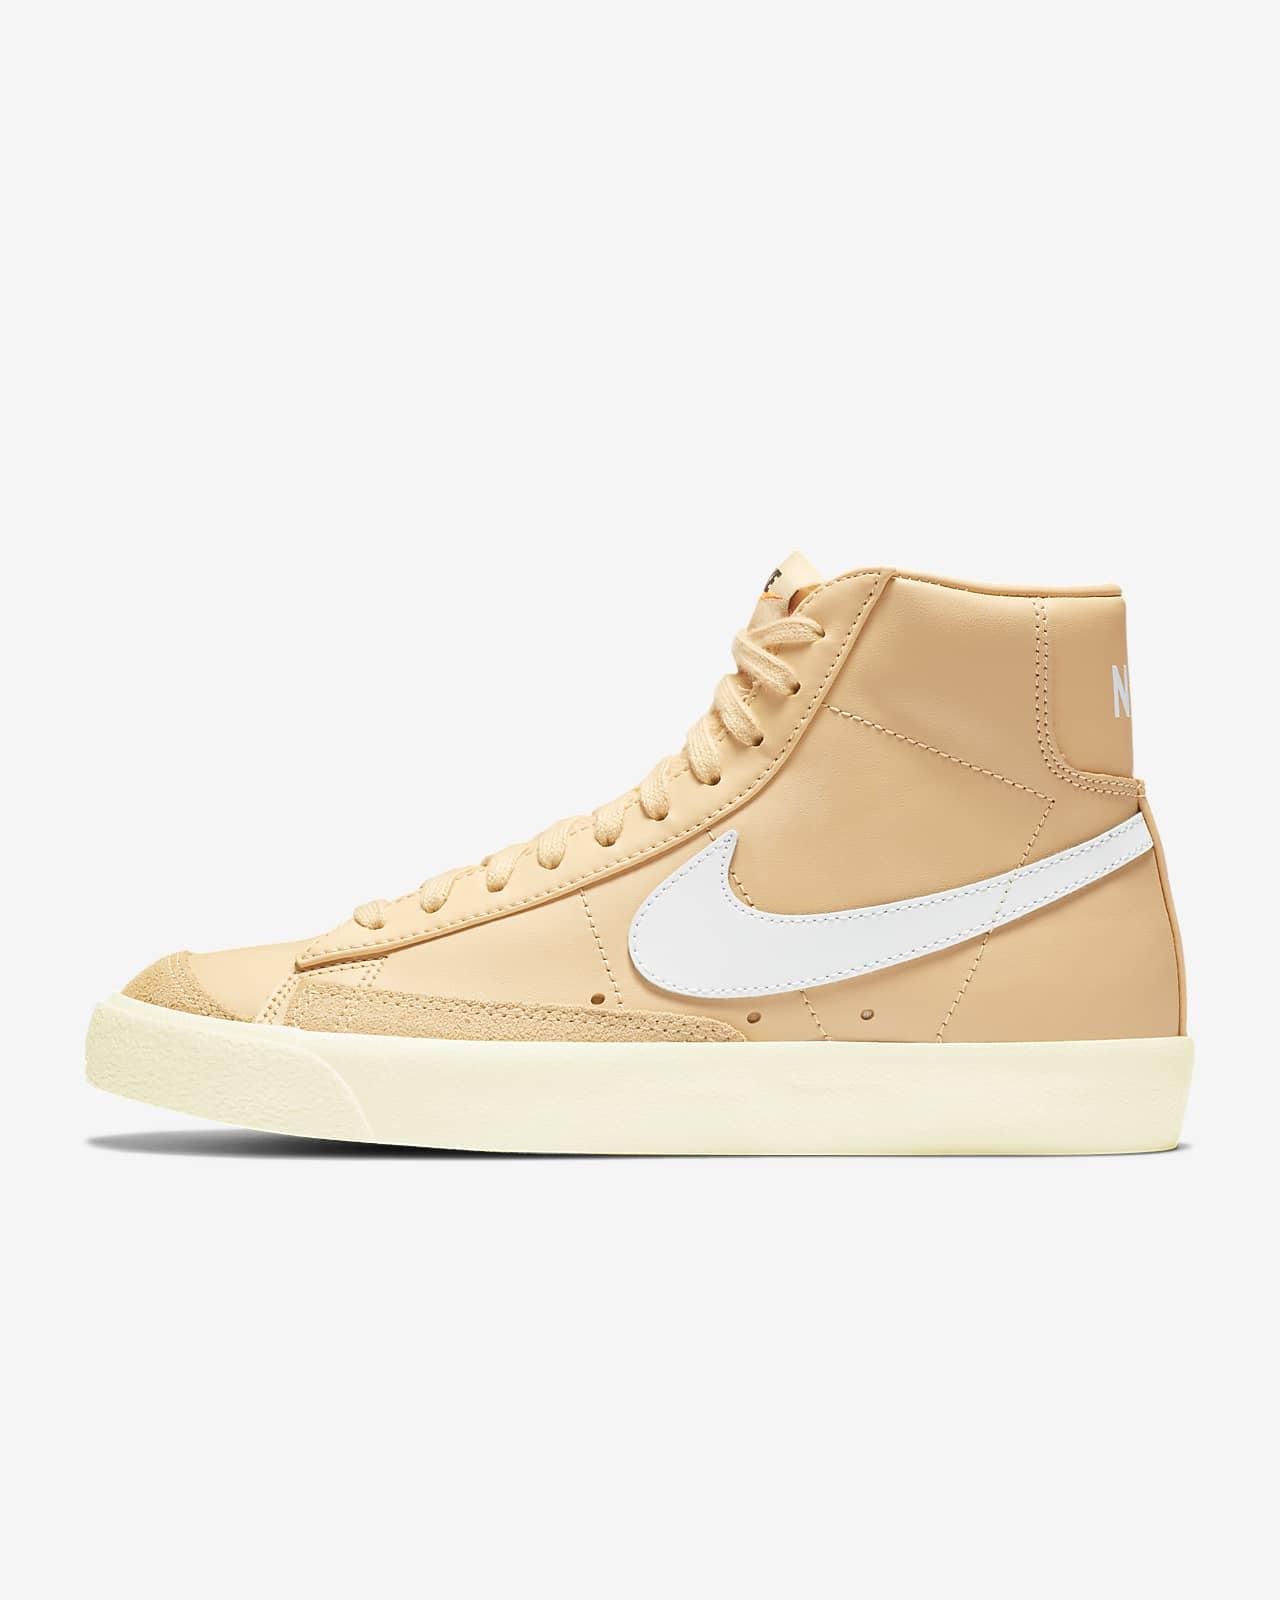 Nike Blazer Mid '77 Vintage Damenschuh